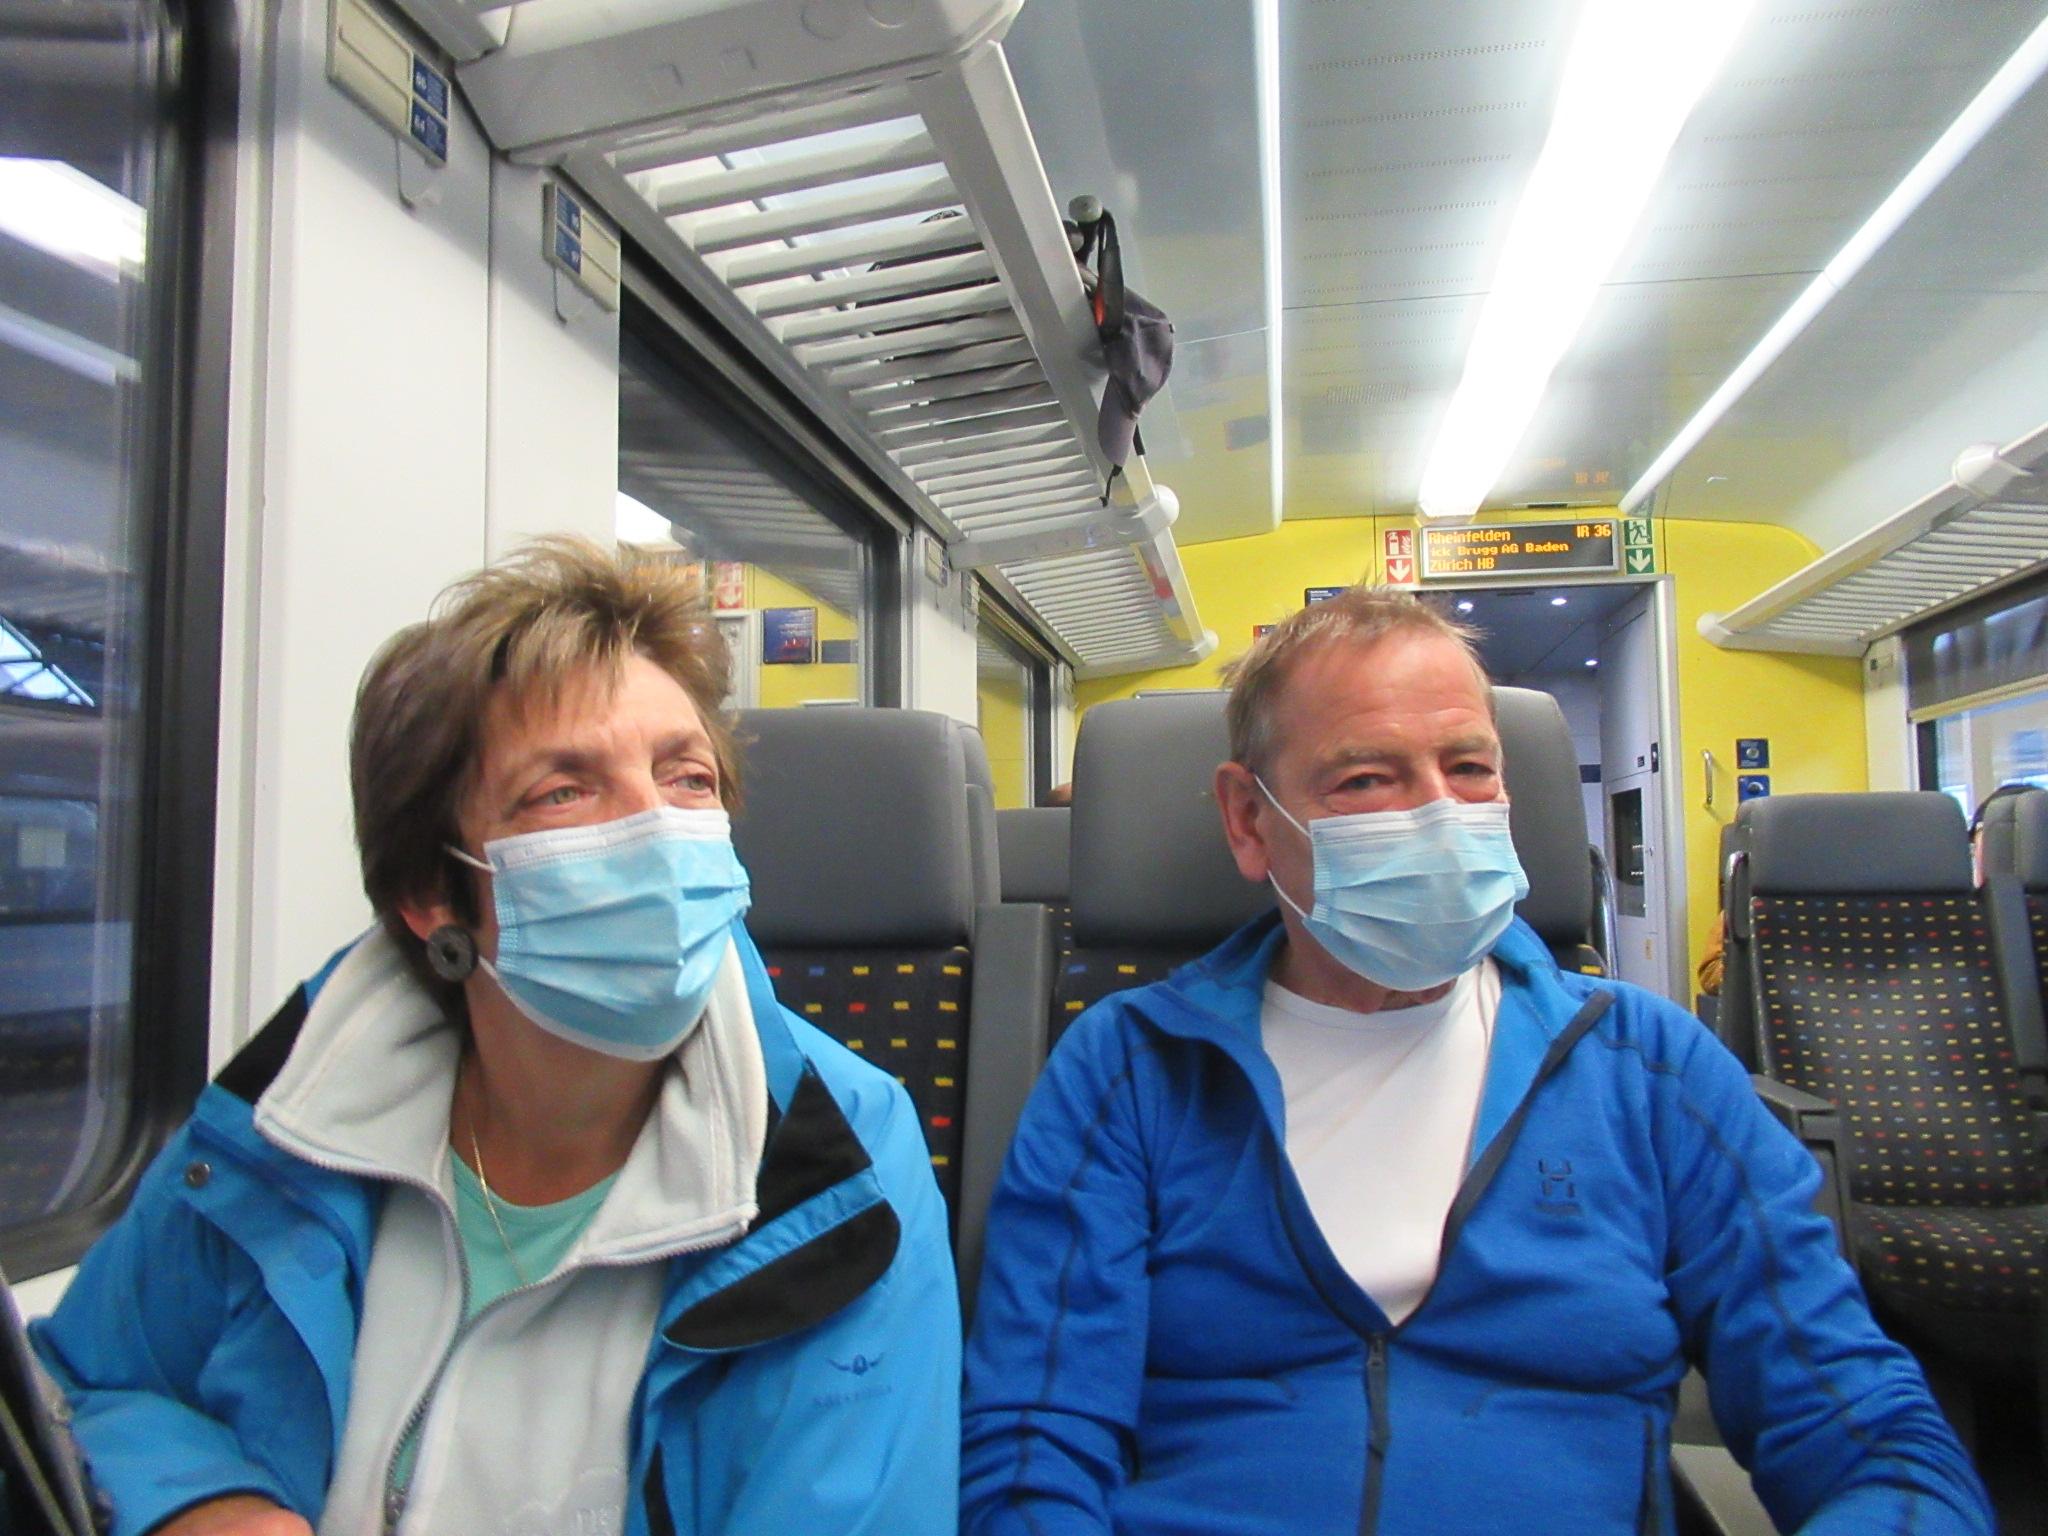 Seniorenwanderung Stafelegg - Oberflachs 01.10.2020